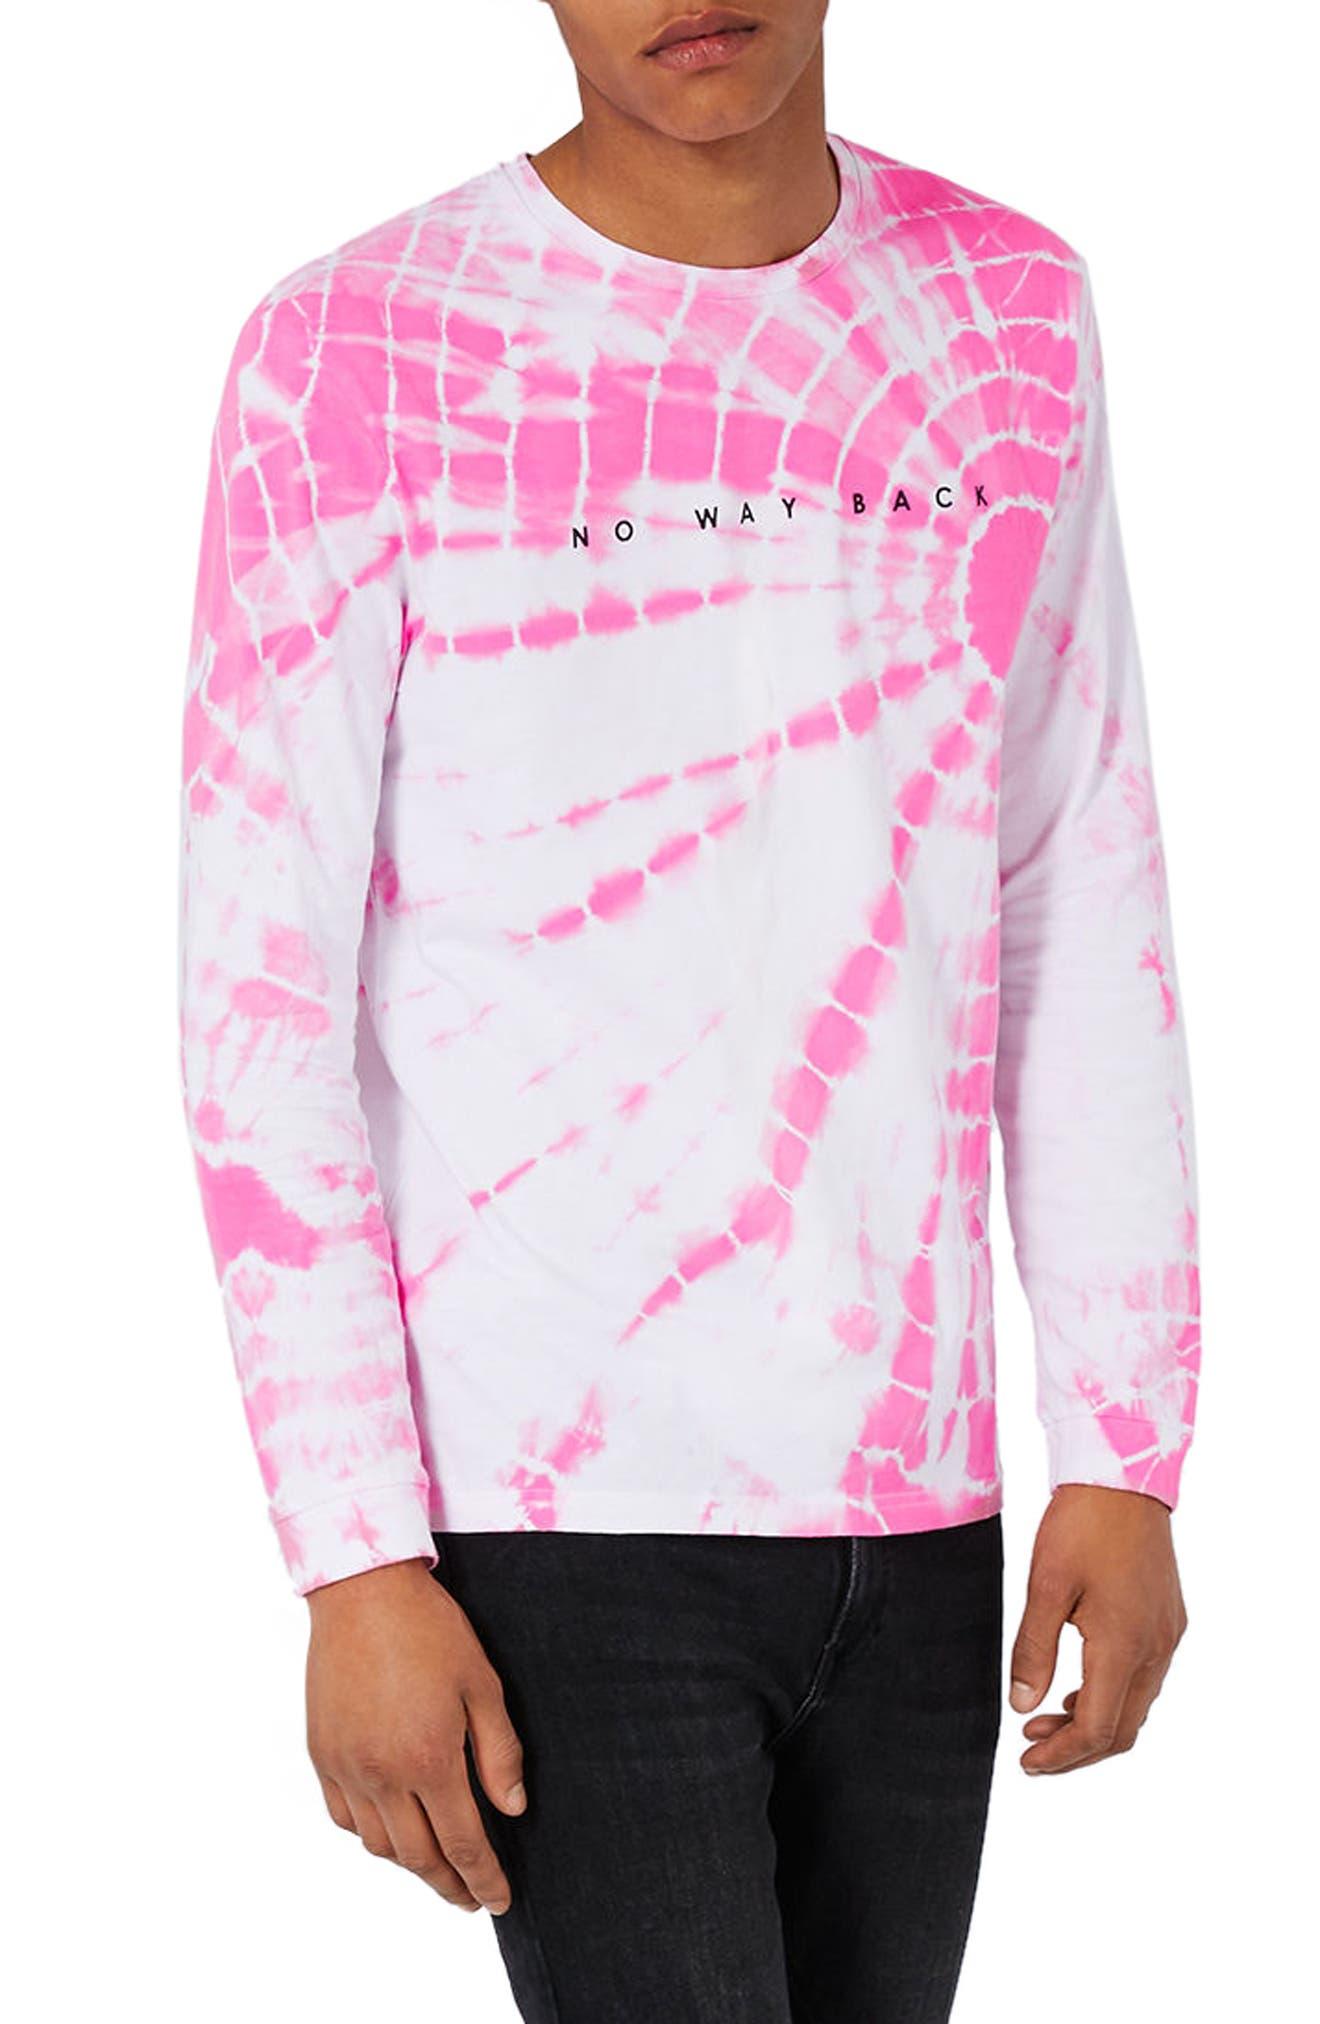 Topman No Way Back Graphic Tie Dye T-Shirt